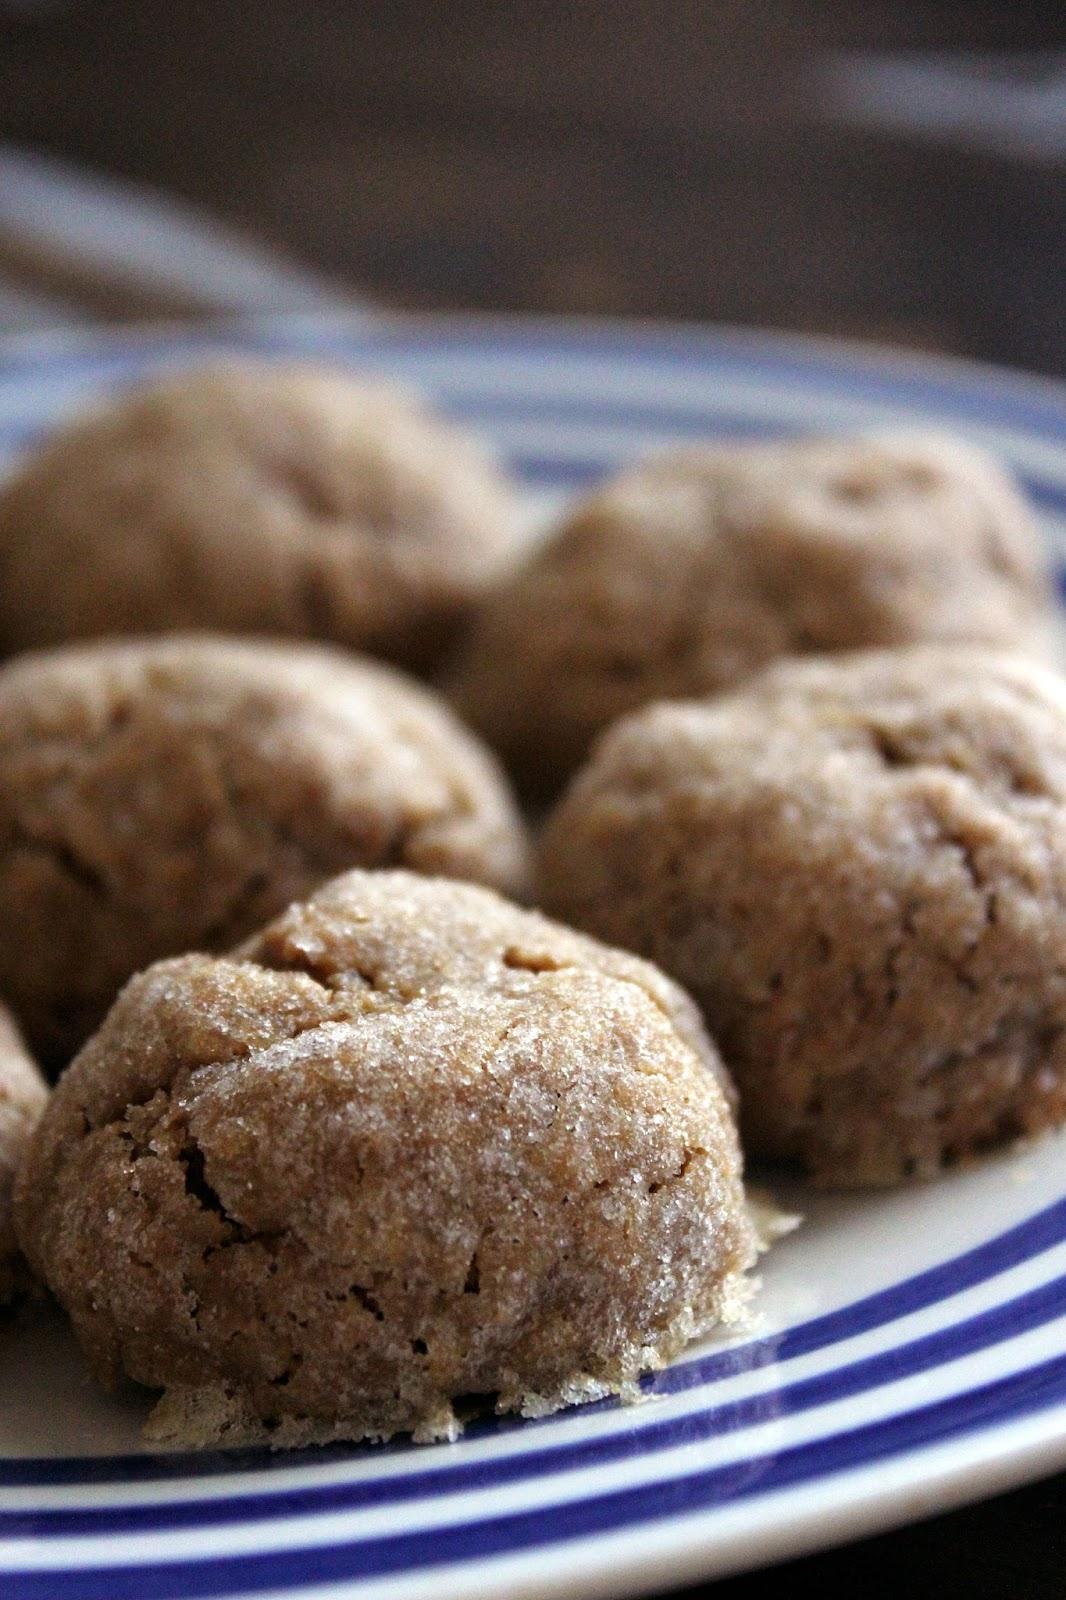 Recipe for Delightfully Dense Peanut Butter Cookies by freshfromthe.com